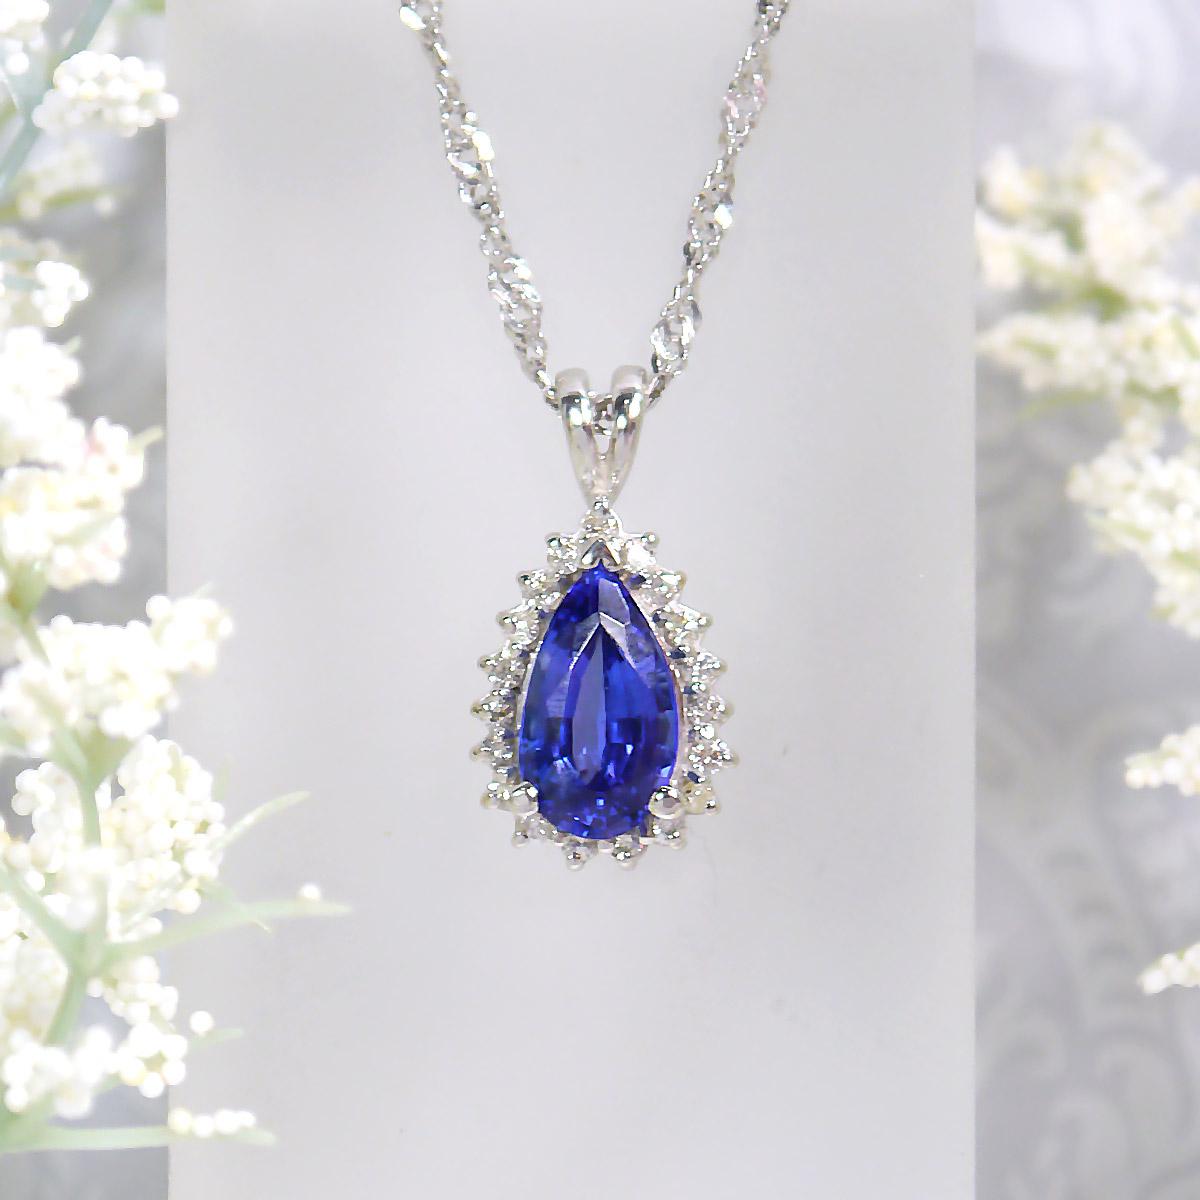 Pear Shaped Tanzanite and Diamond Halo Pendant in 14k